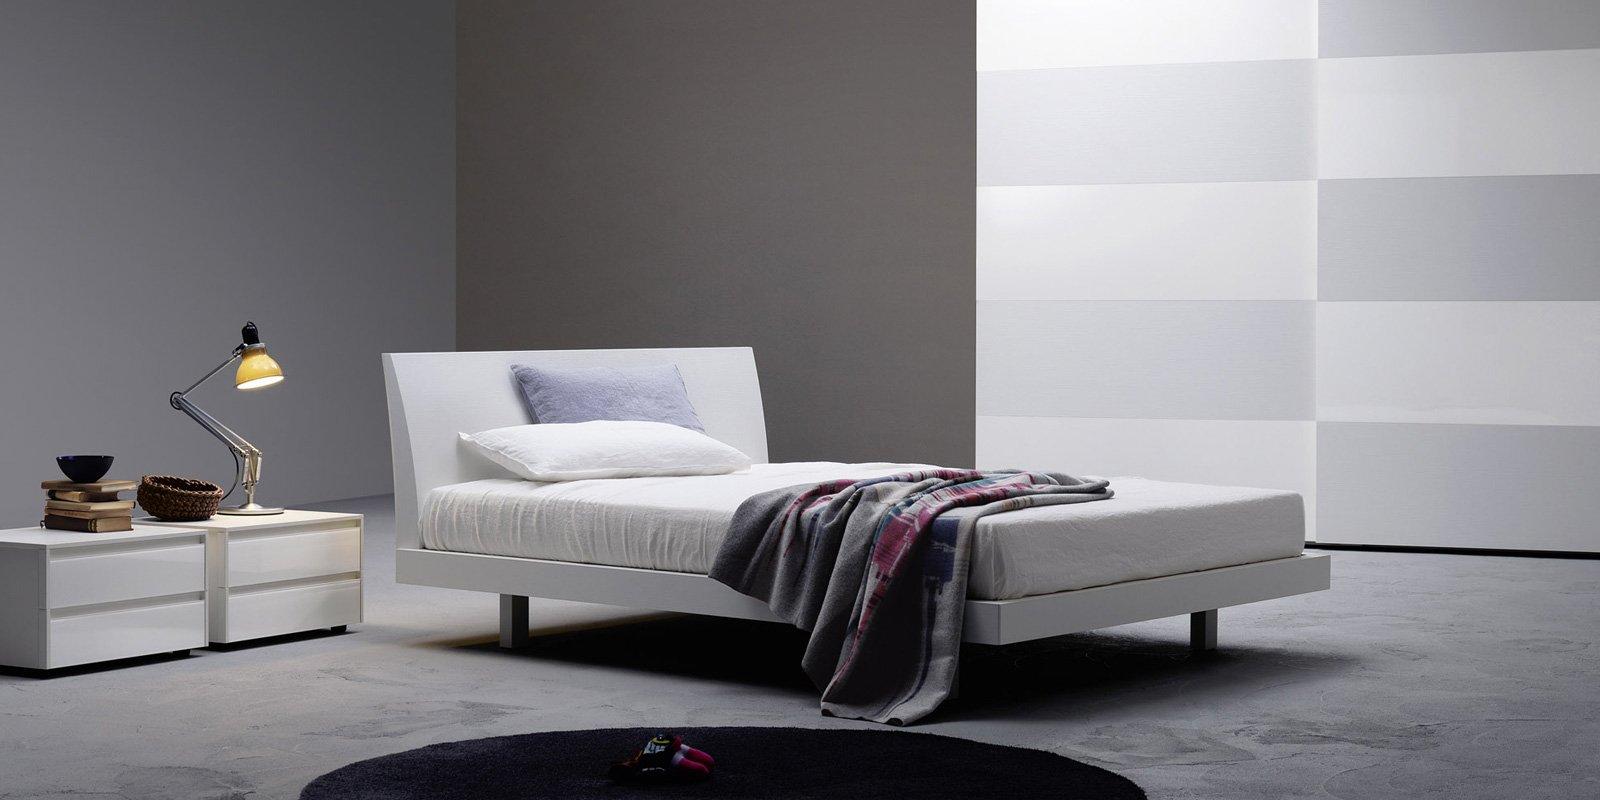 Contemporary Bedroom Furniture In Southern Ca - Brio bed